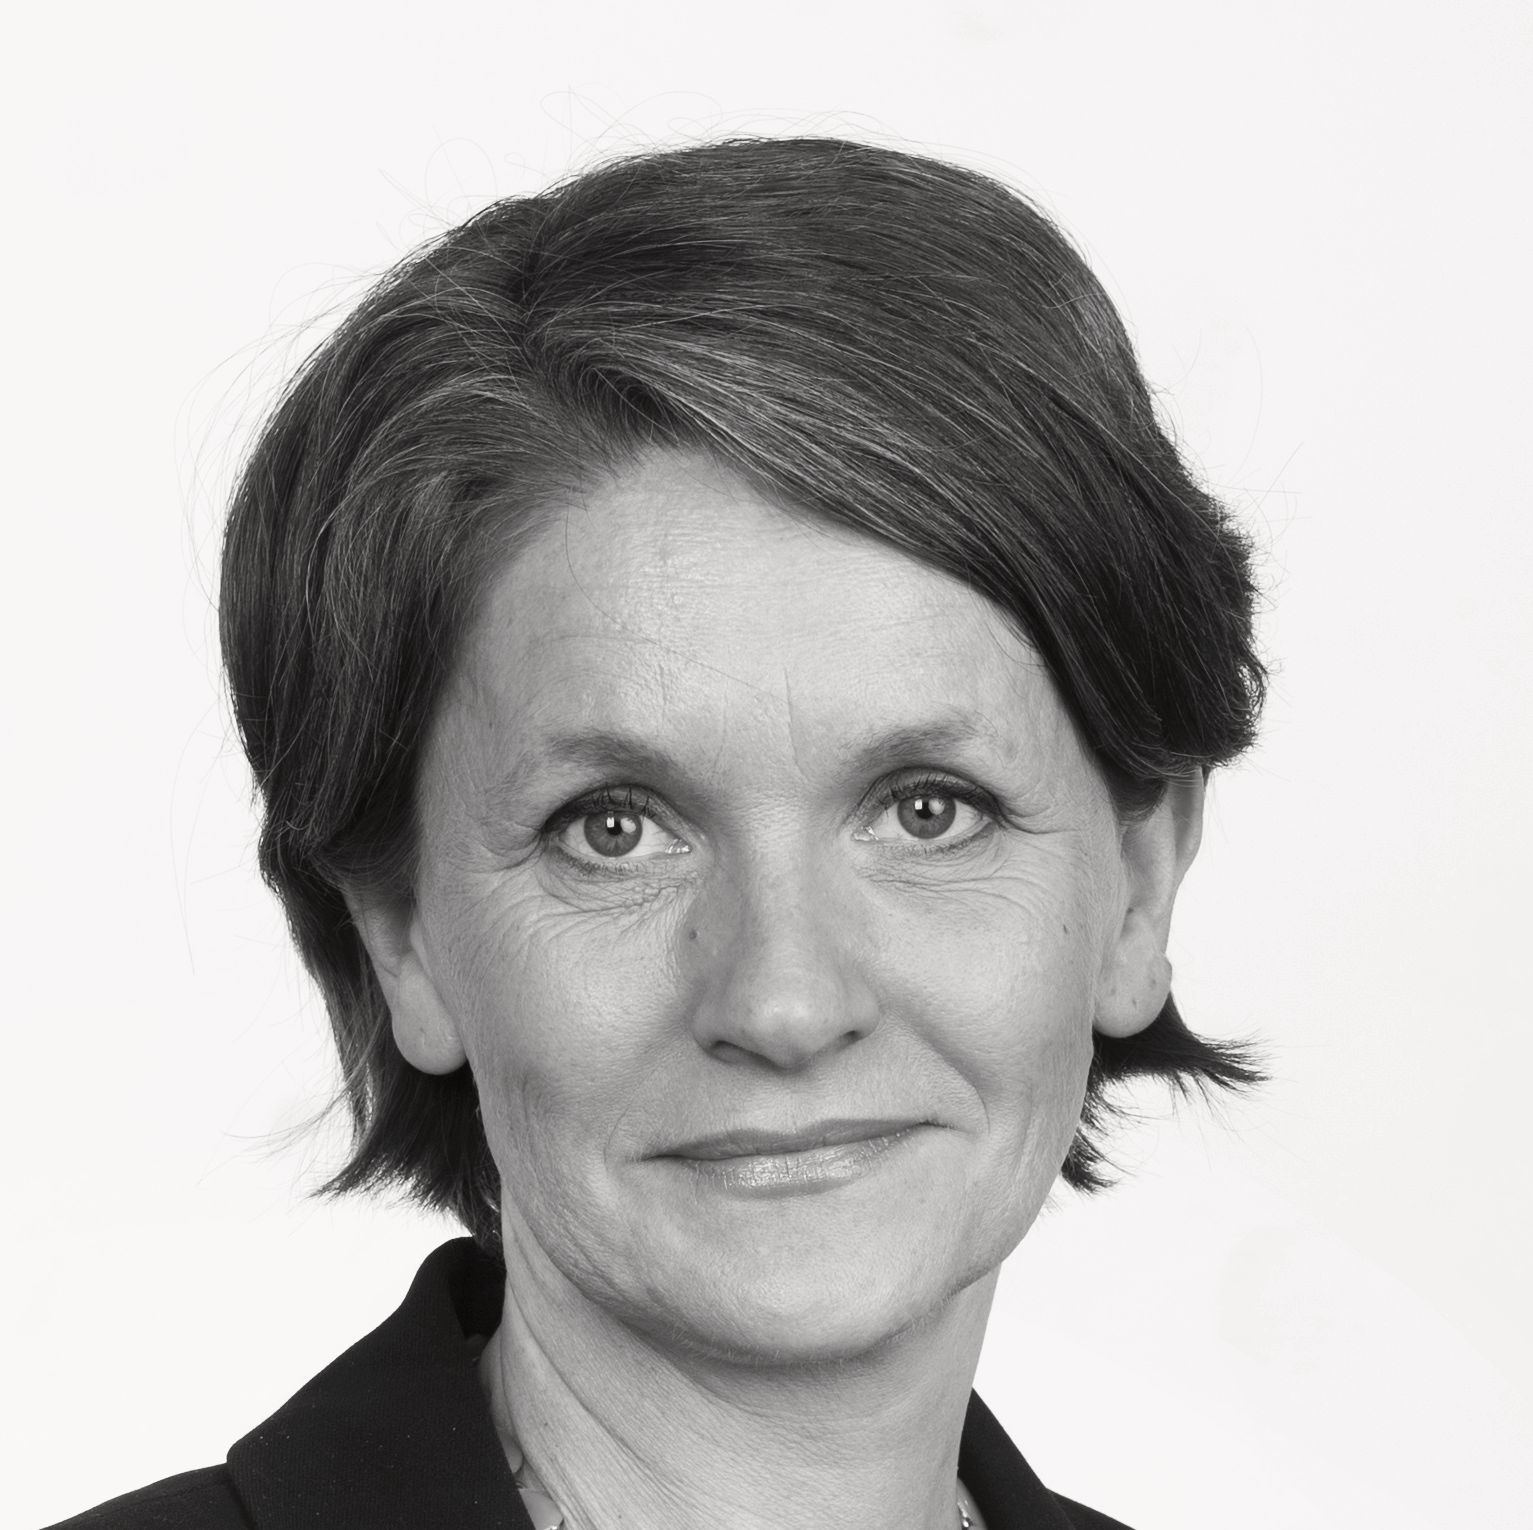 Hanne Skartveit